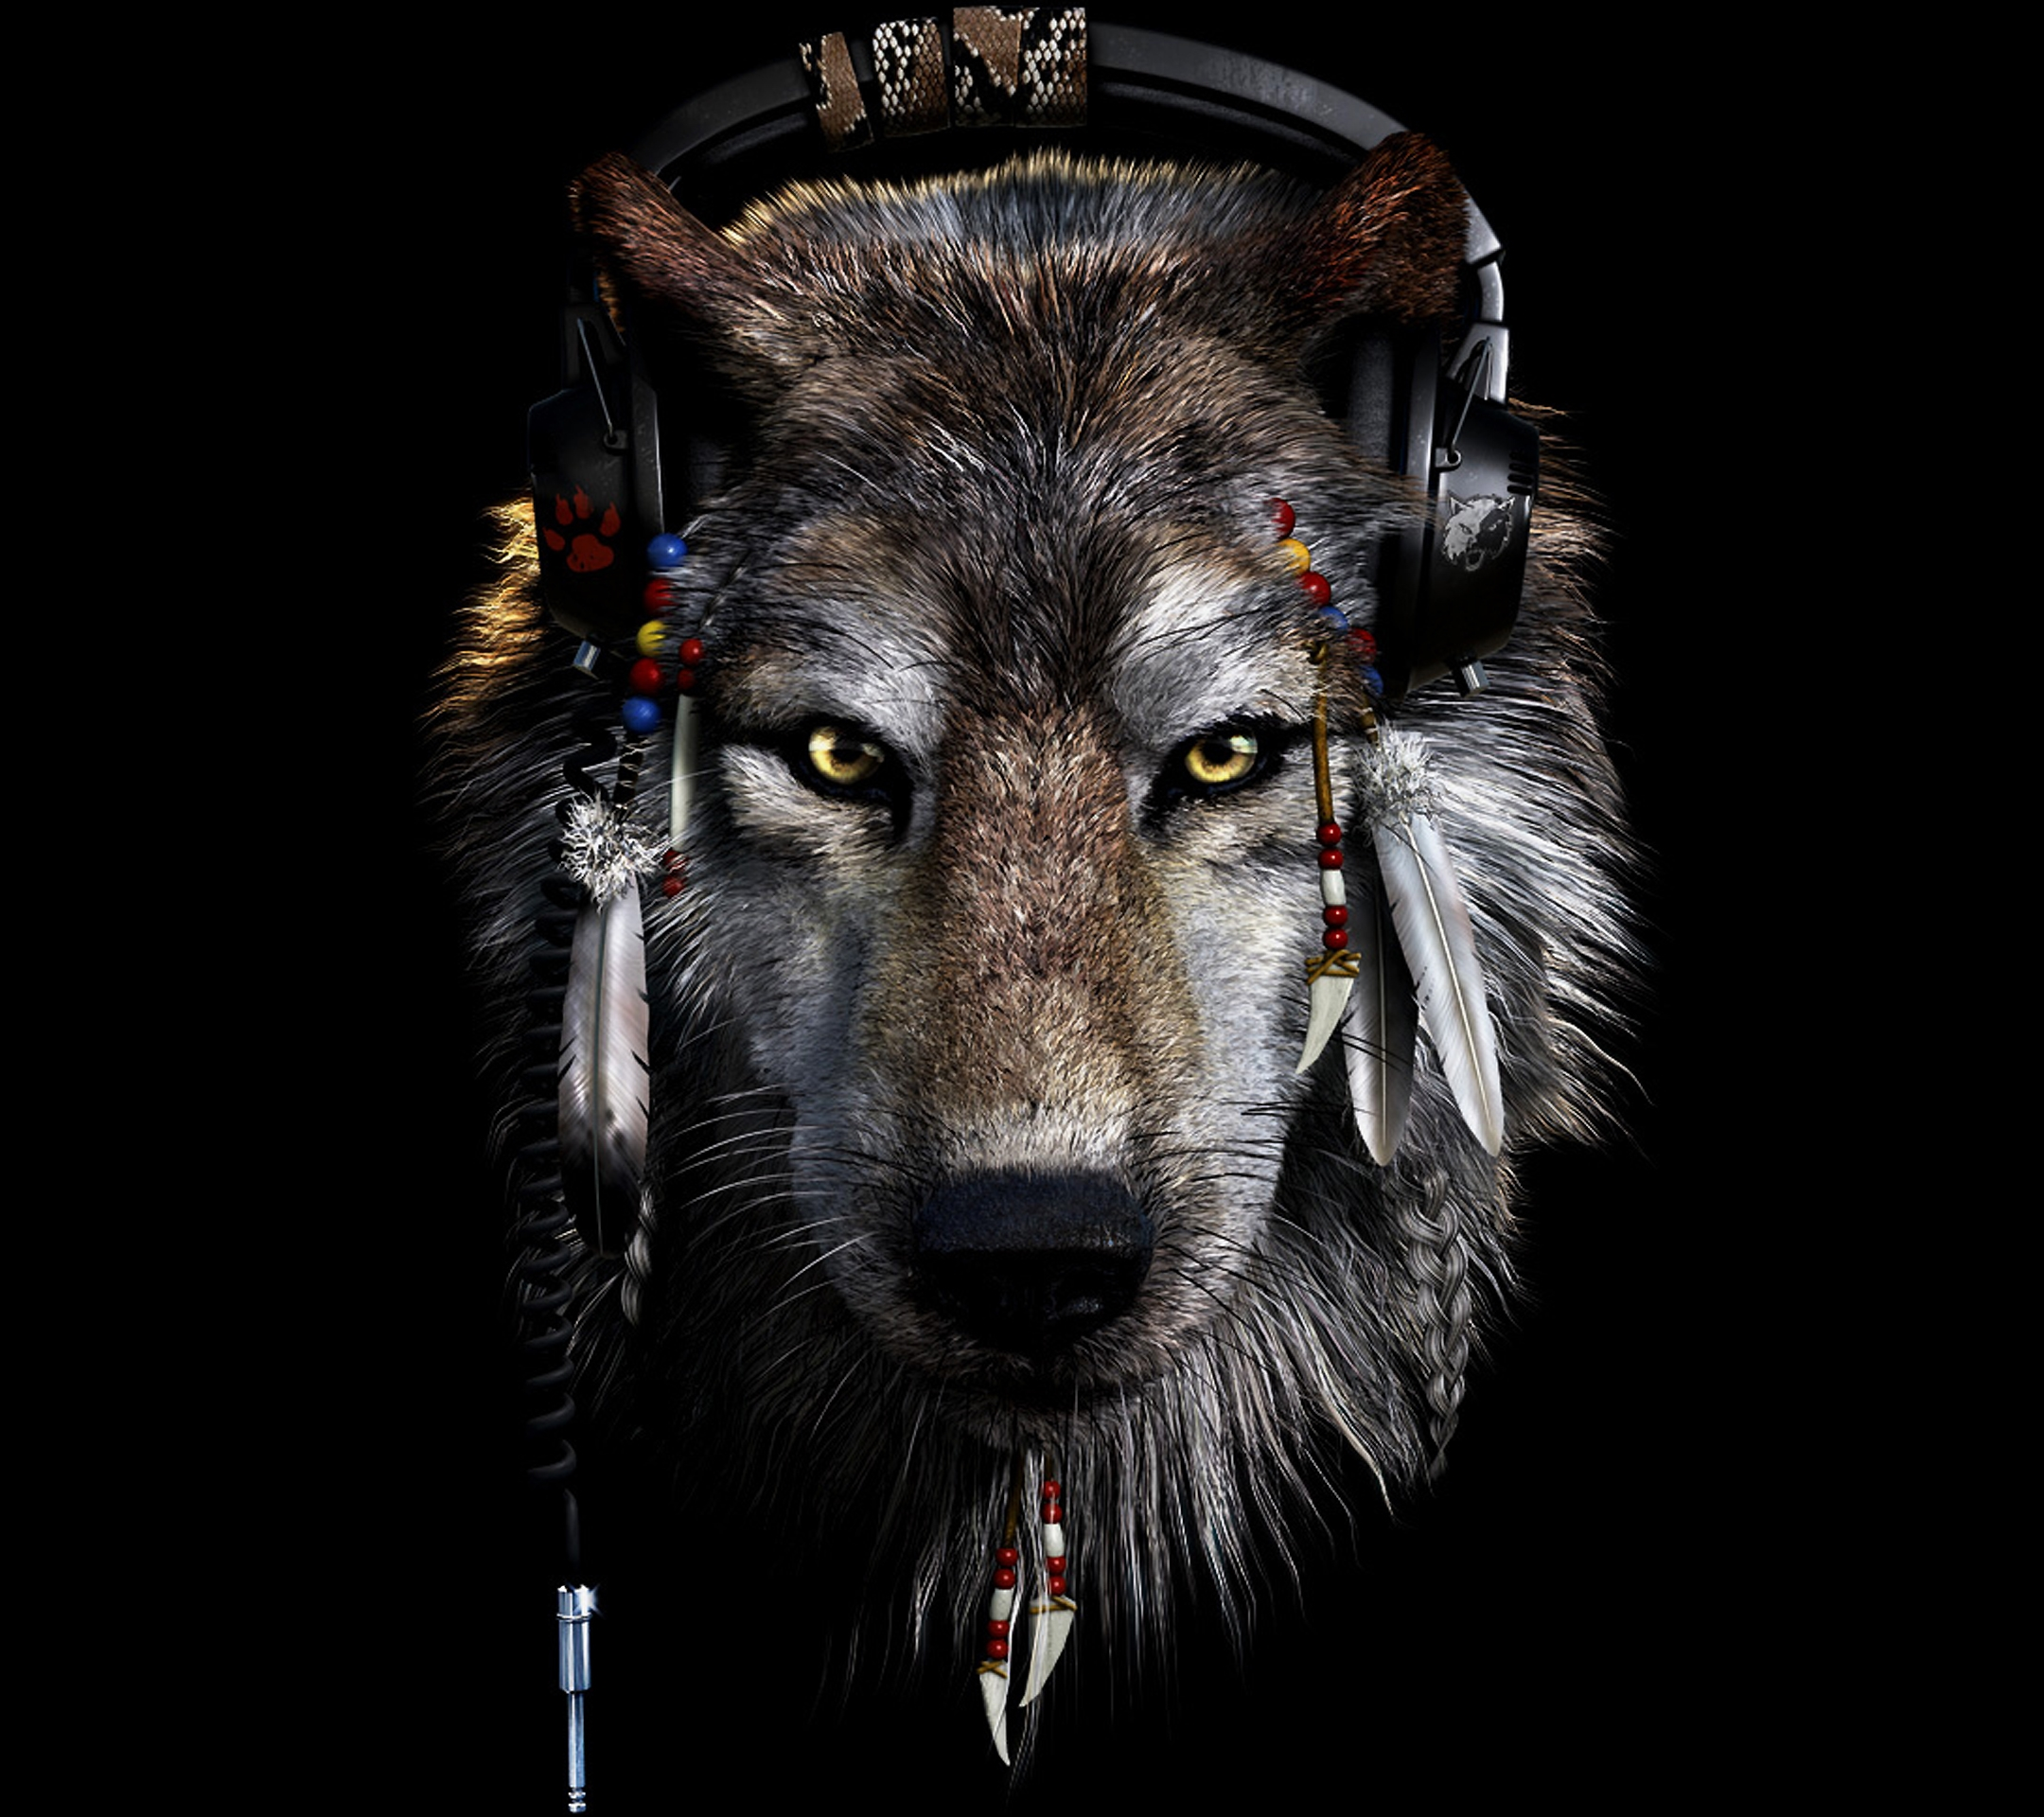 Indians and Wolves Wallpaper - WallpaperSafari